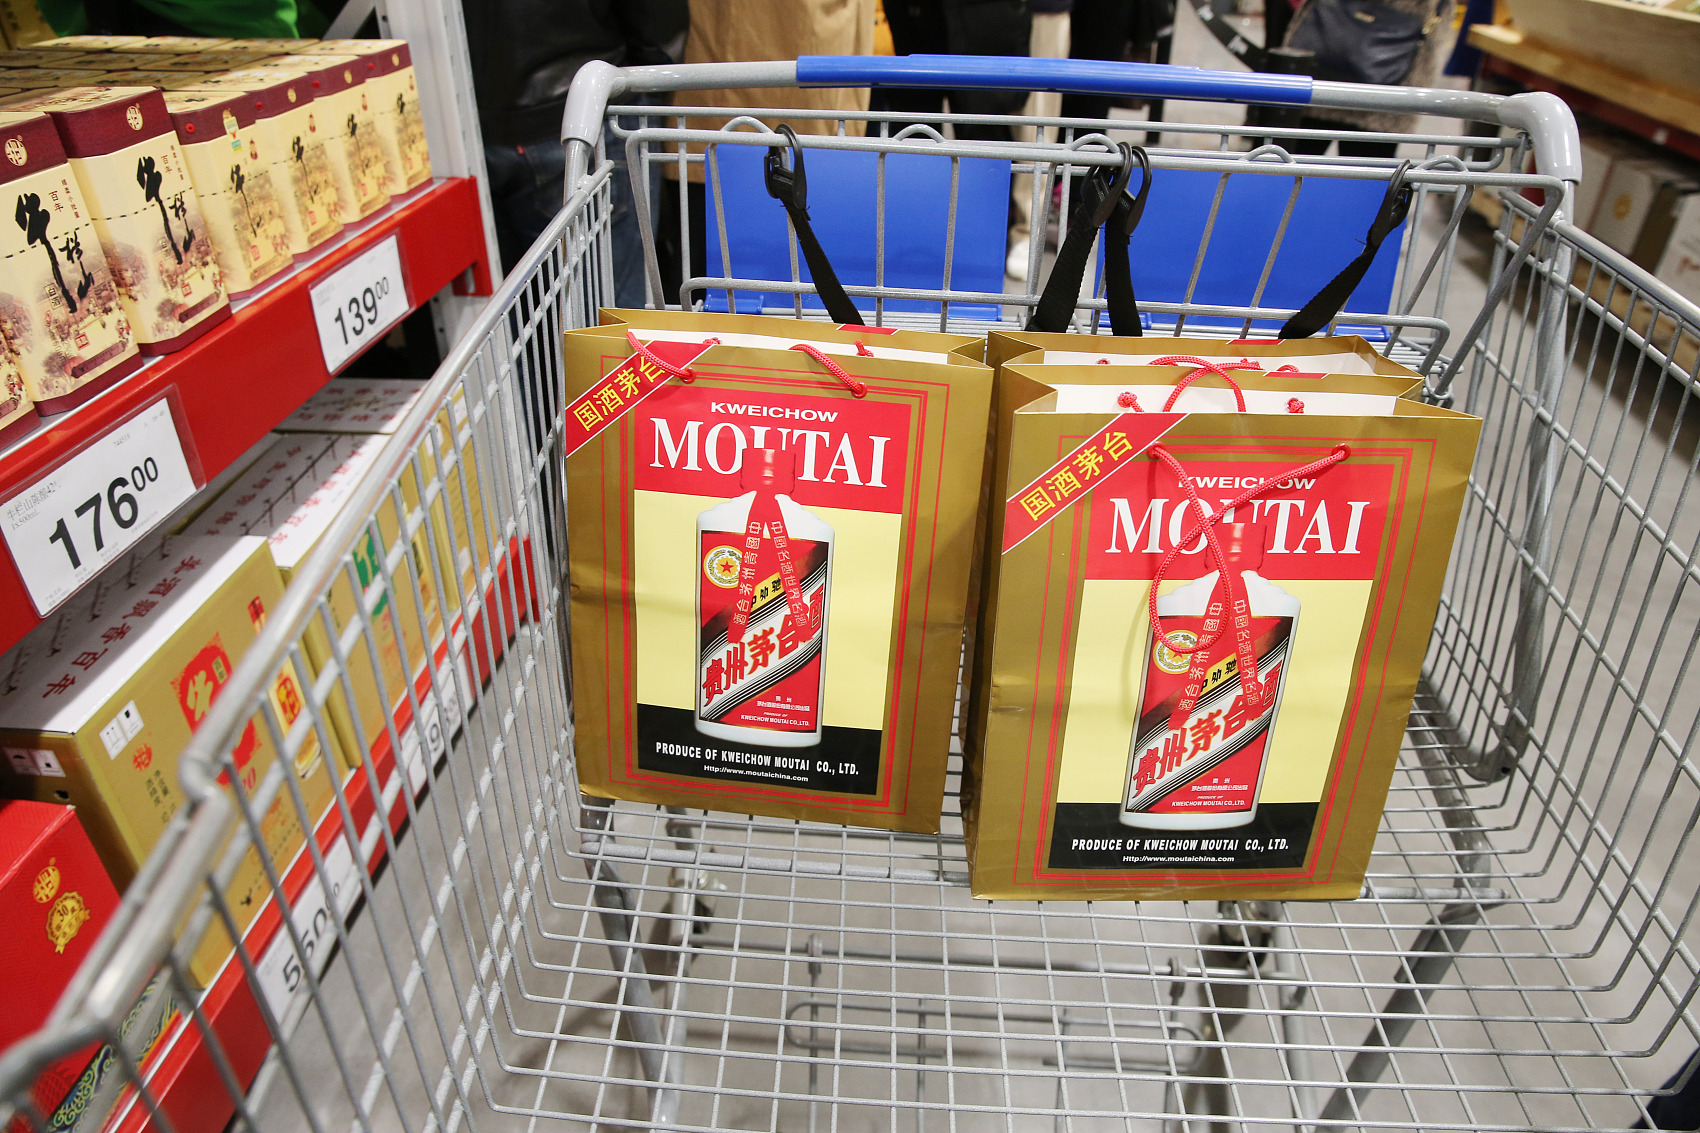 China's top liquor brand Moutai's net profit surges in 2018